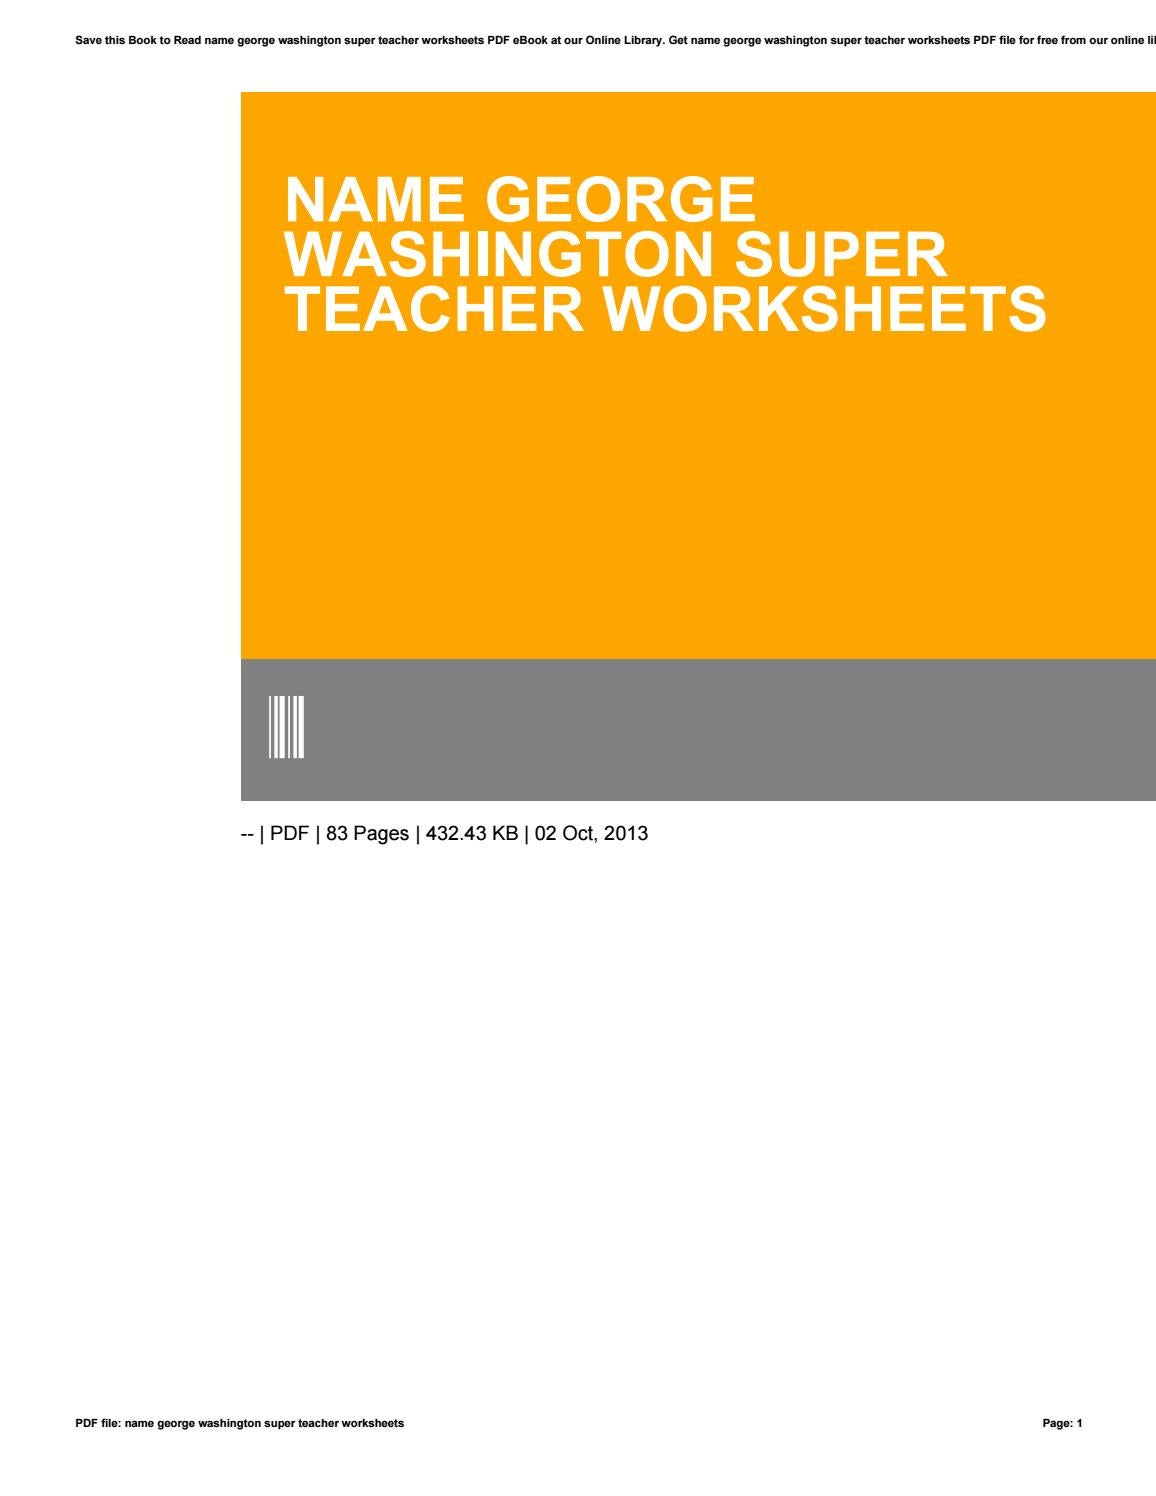 Workbooks super teacher worksheets pdf : Name george washington super teacher worksheets by te110 - issuu